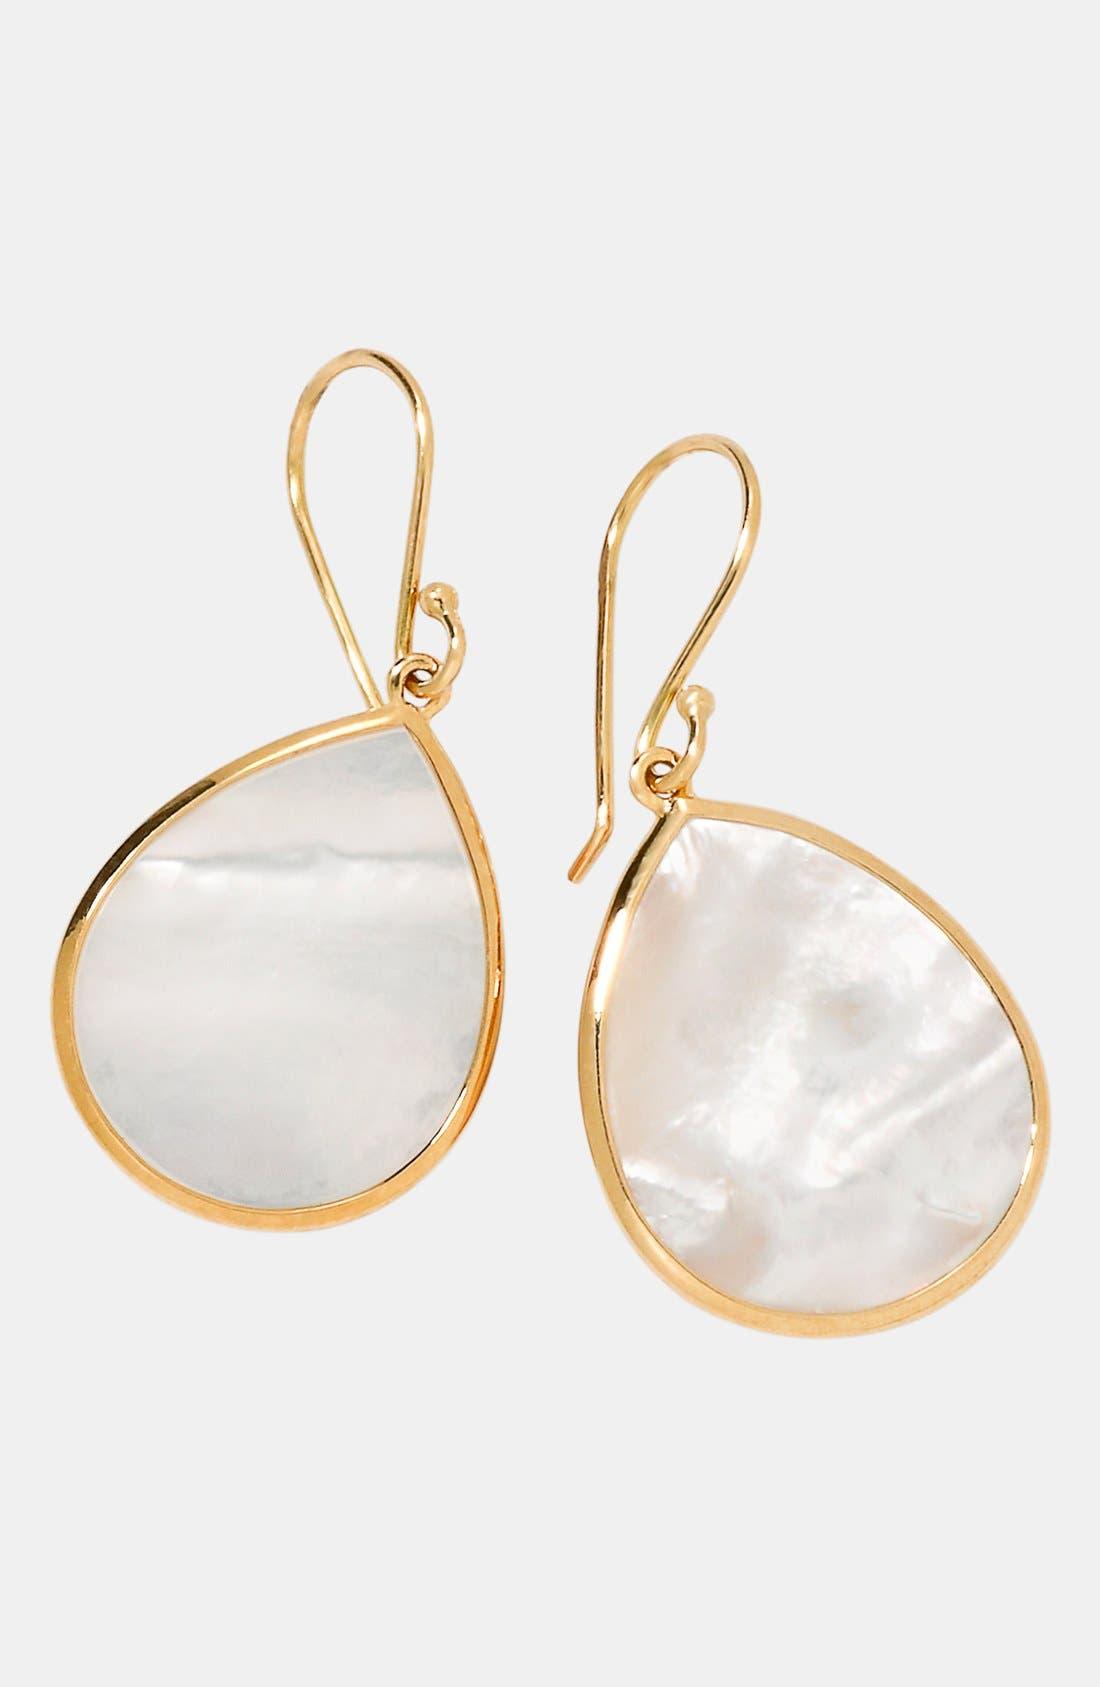 Alternate Image 1 Selected - Ippolita 'Rock Candy - Mini Teardrop' 18k Gold Earrings